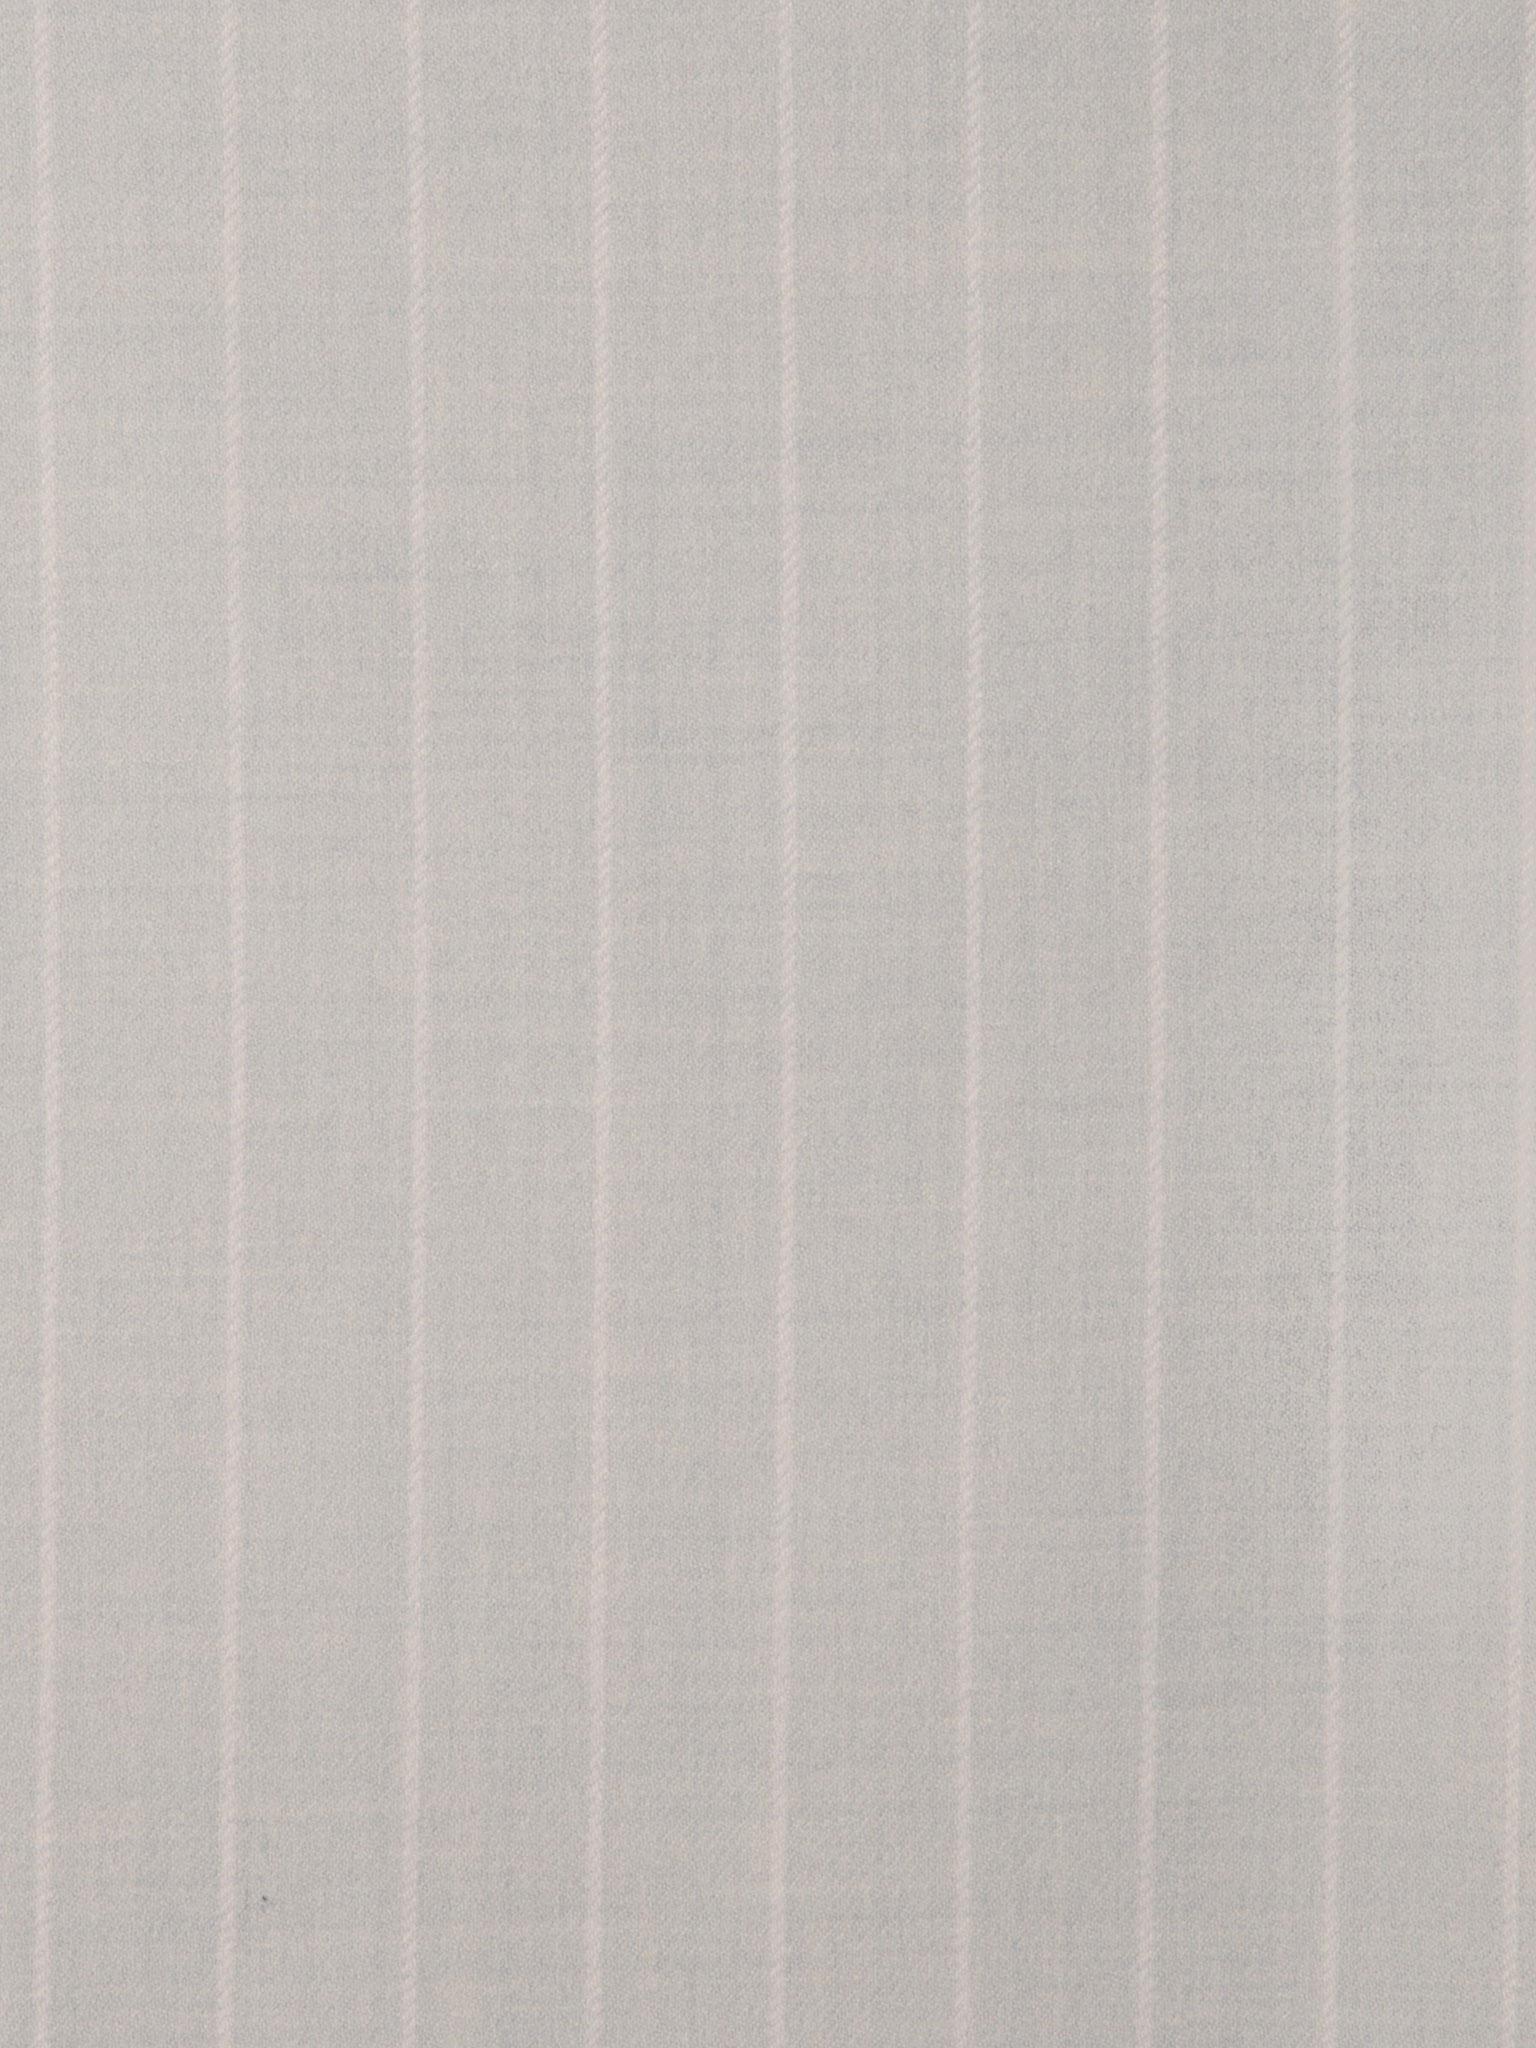 SAVILE ROW CHALK STRIPE DE12066